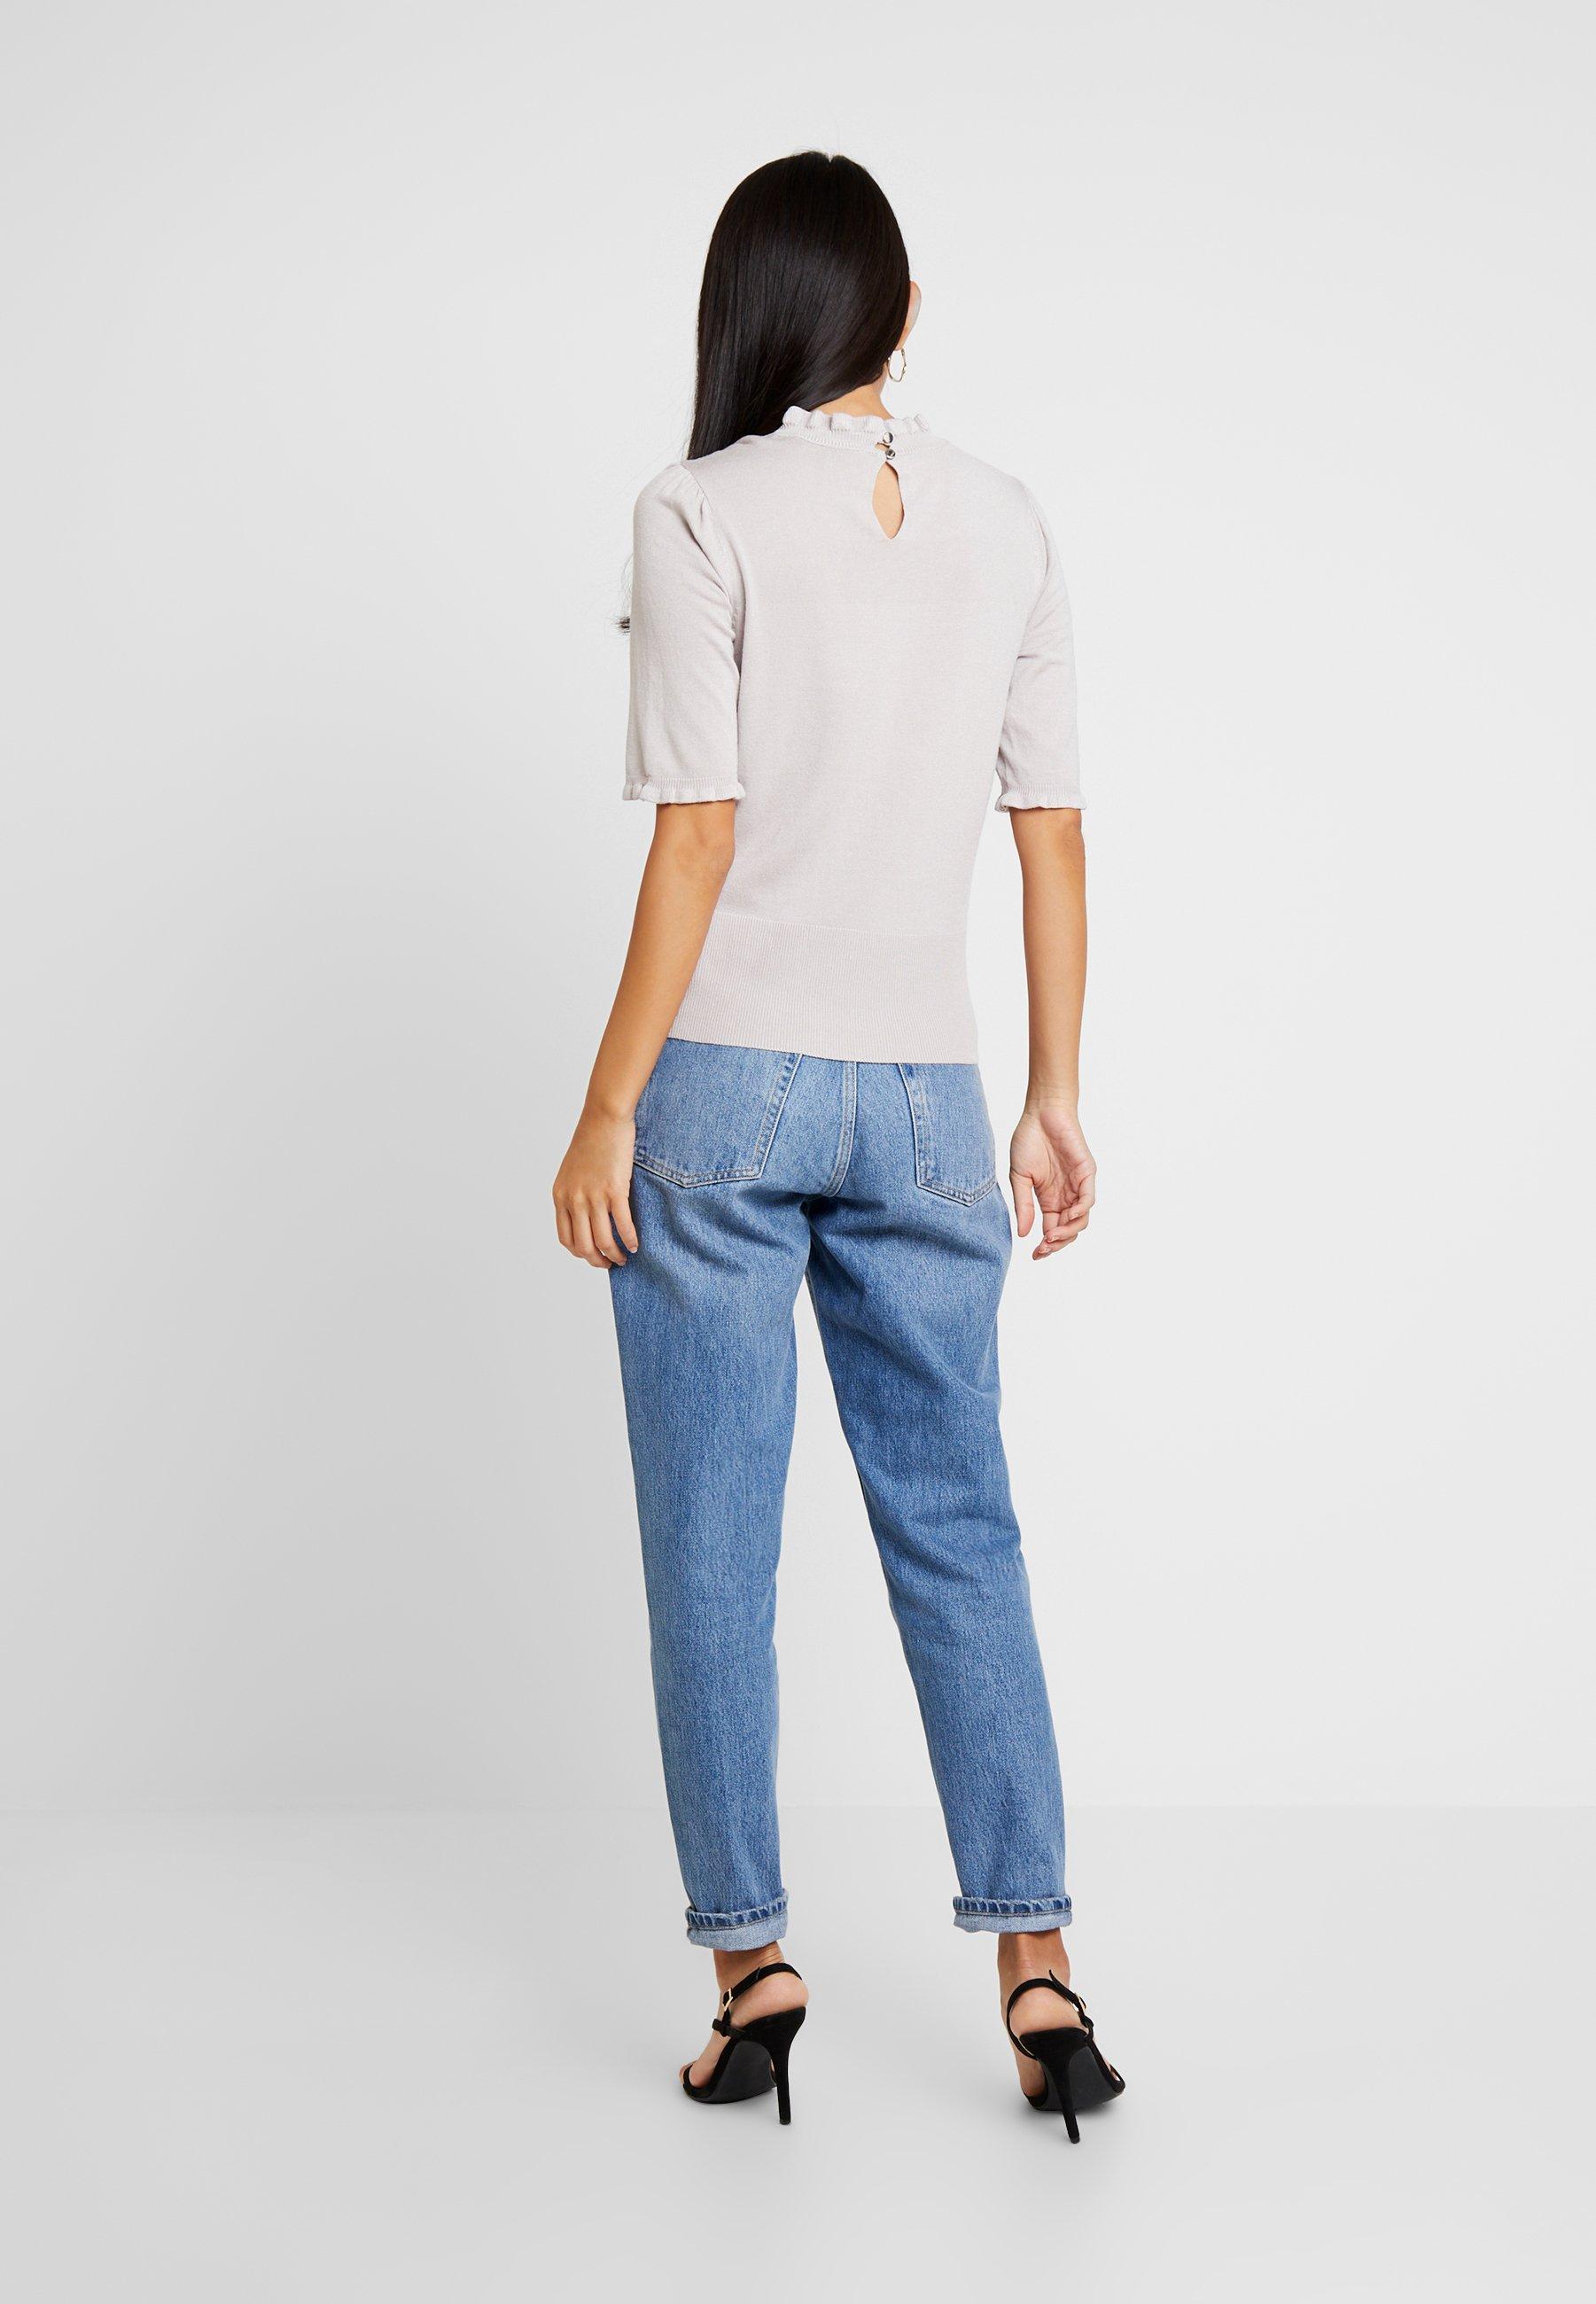 Woven Grey Front Oasis Rose Cayla Shirt JumperPullover Multi Neck xBeWdorC